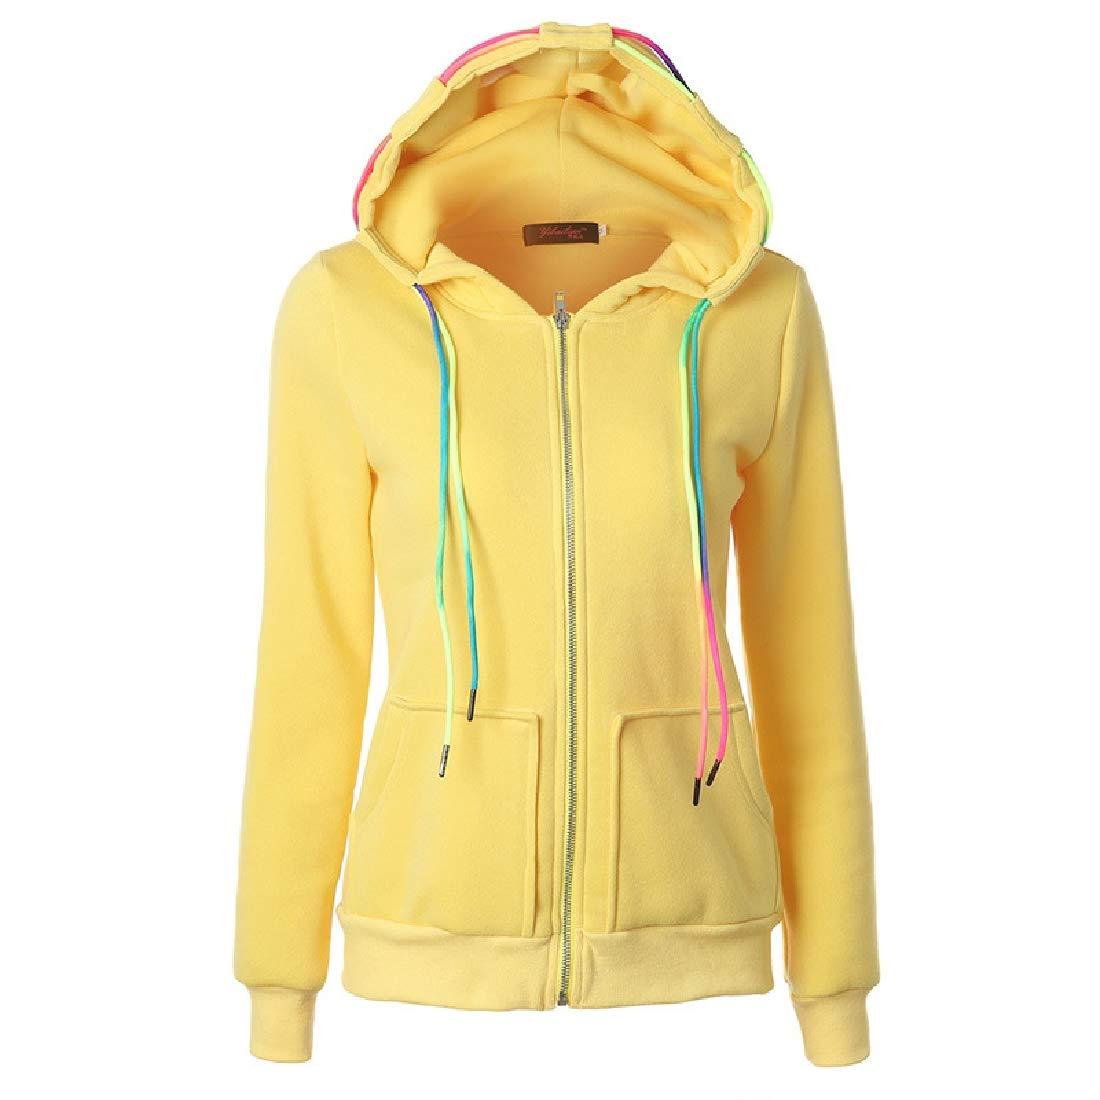 Fubotevic Womens Drawstring Zip Up Solid Casual Hoodies Sweatshirt Coat Jacket